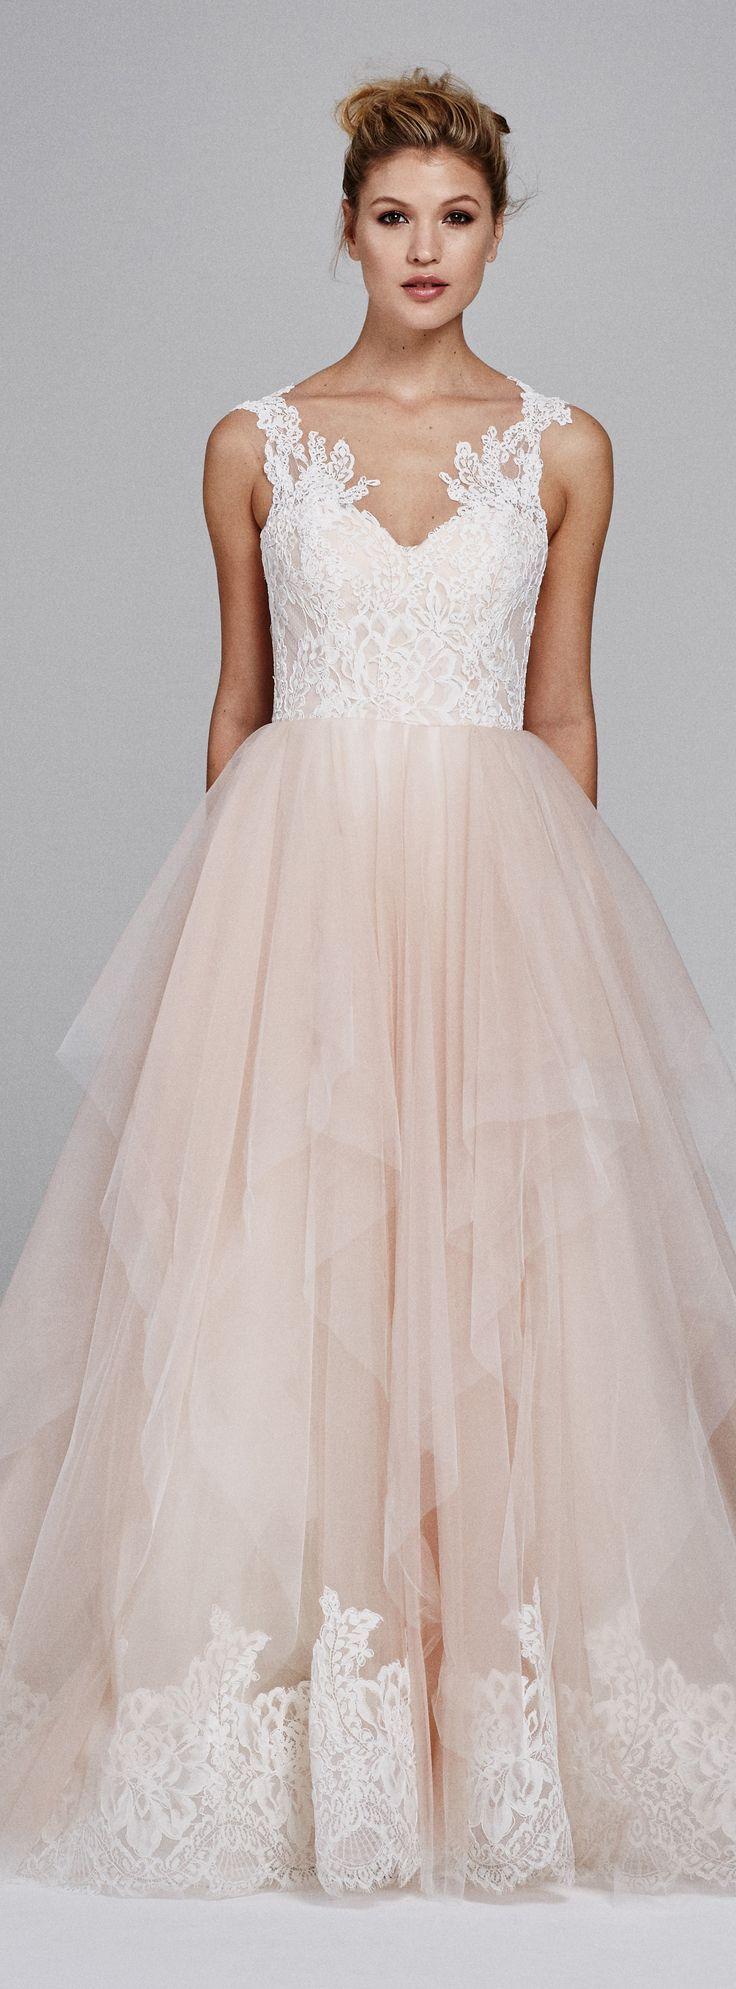 1000 Ideas About Ivory Lace Wedding Dress On Pinterest